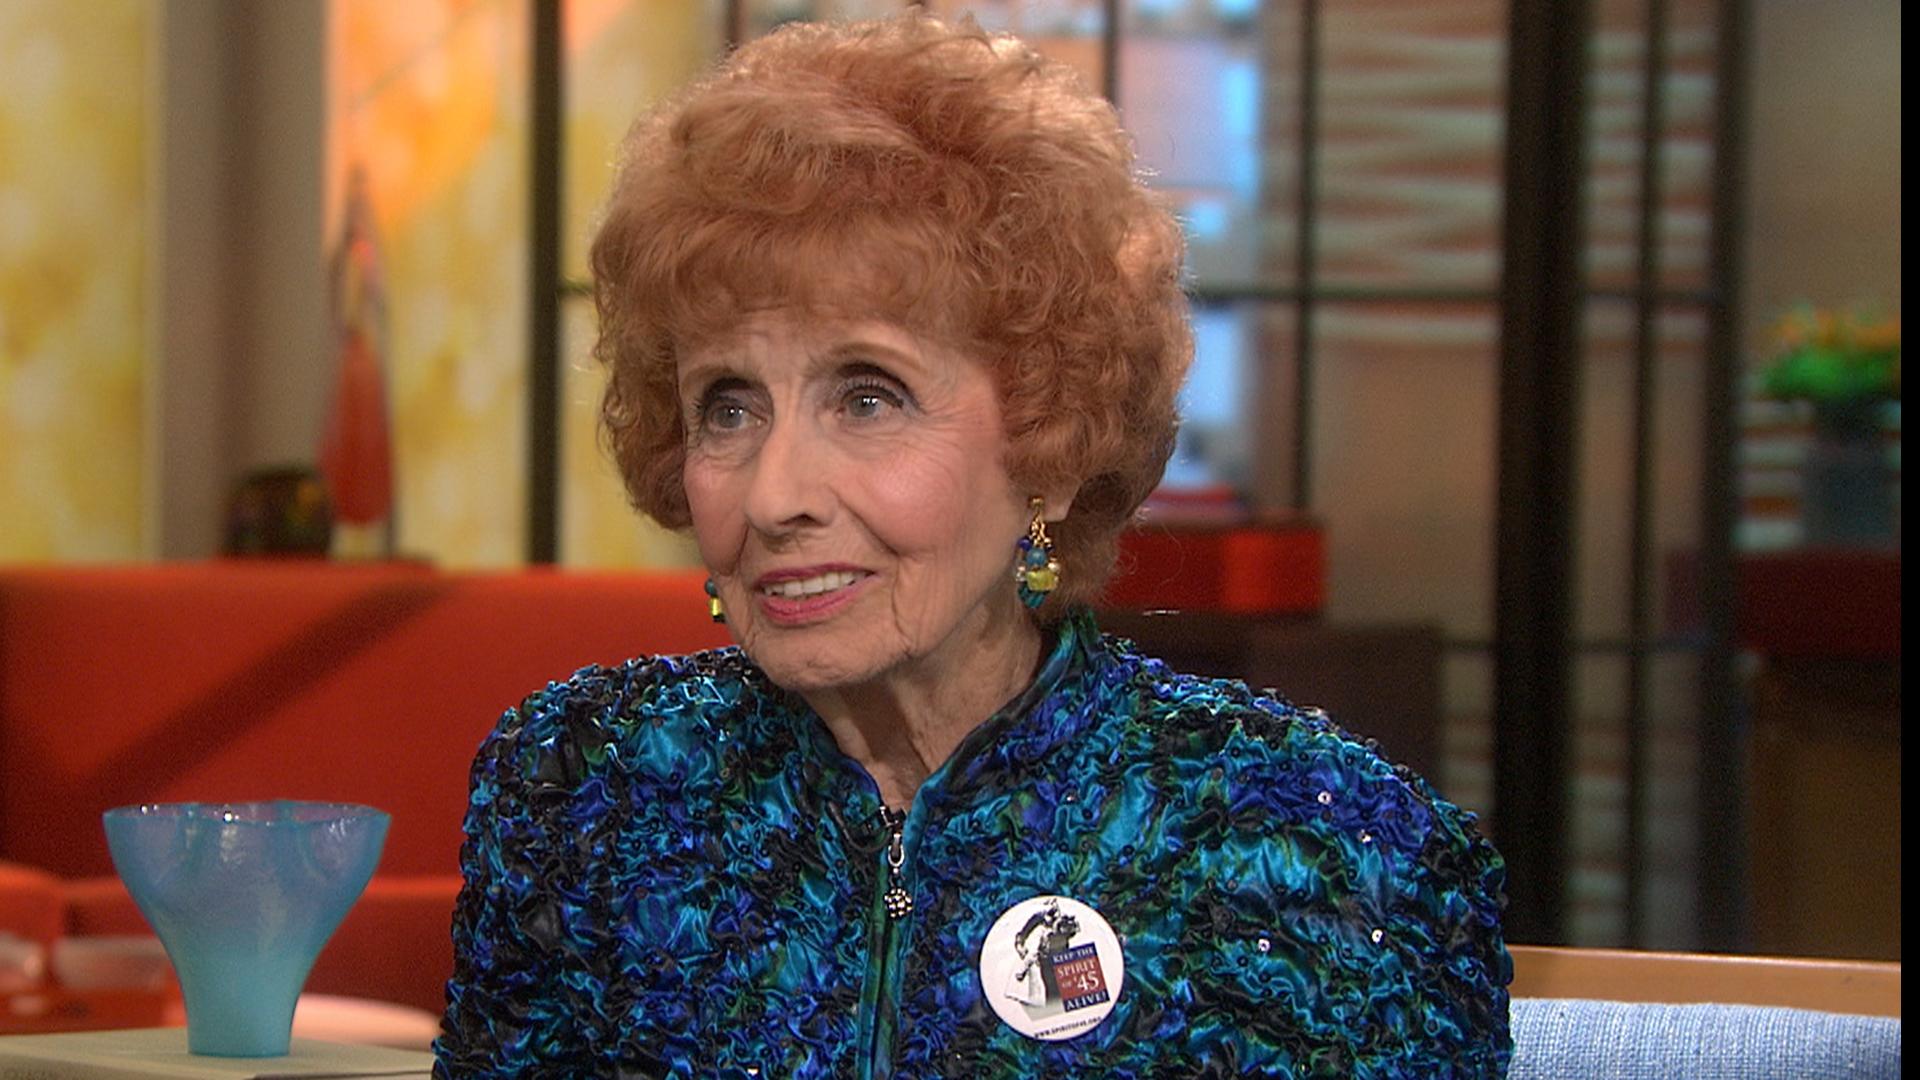 Member Of Rosie The Riveter Brigade Still Going At 93